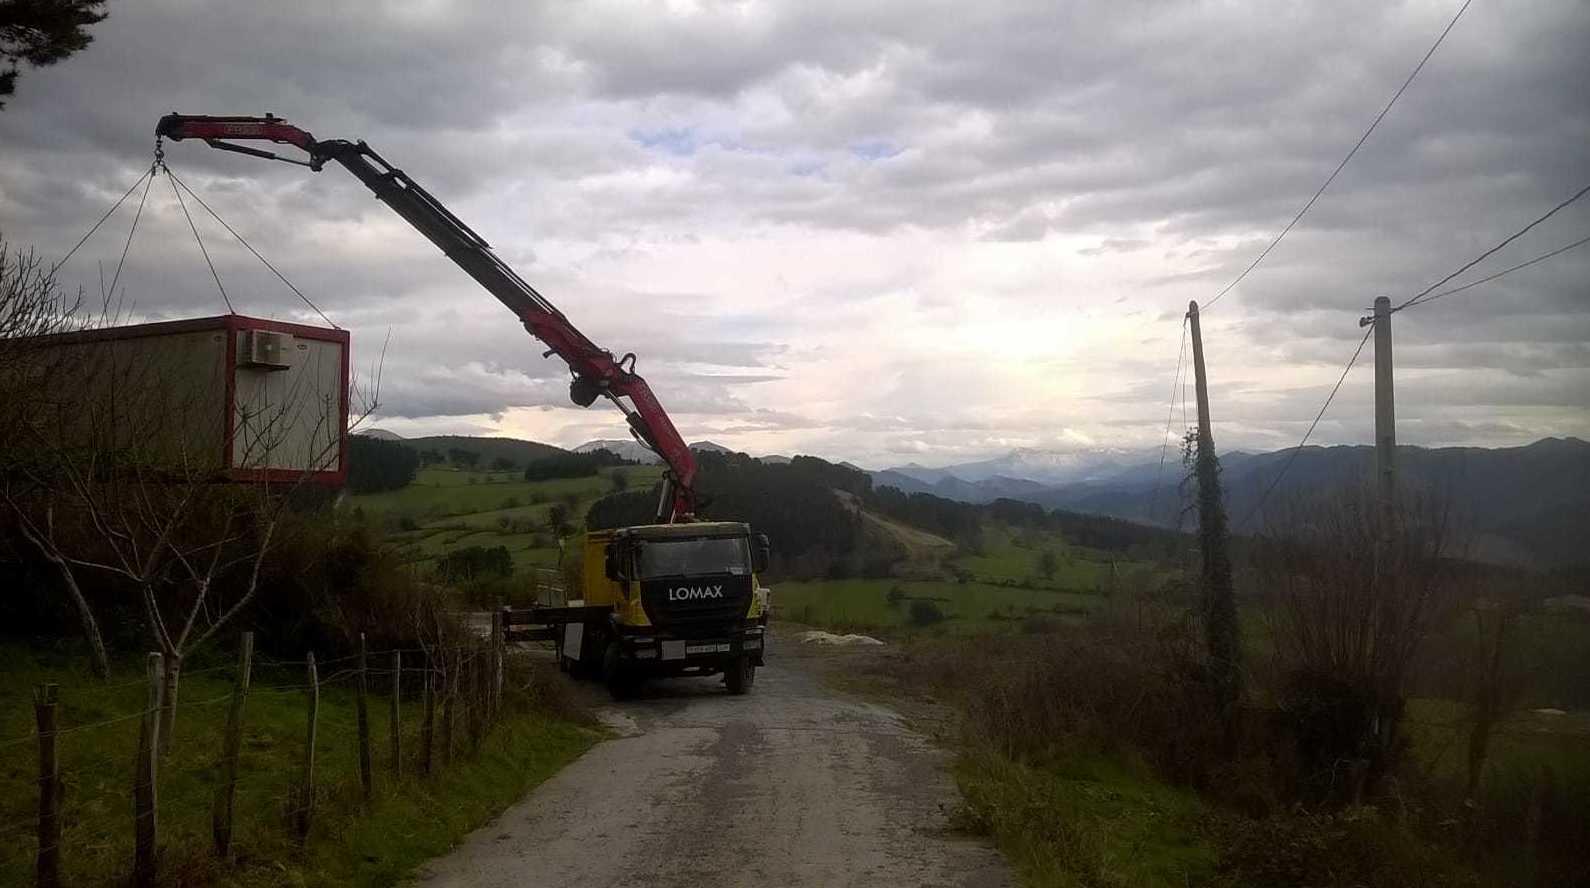 Descarga de caseta de obra en larrauri